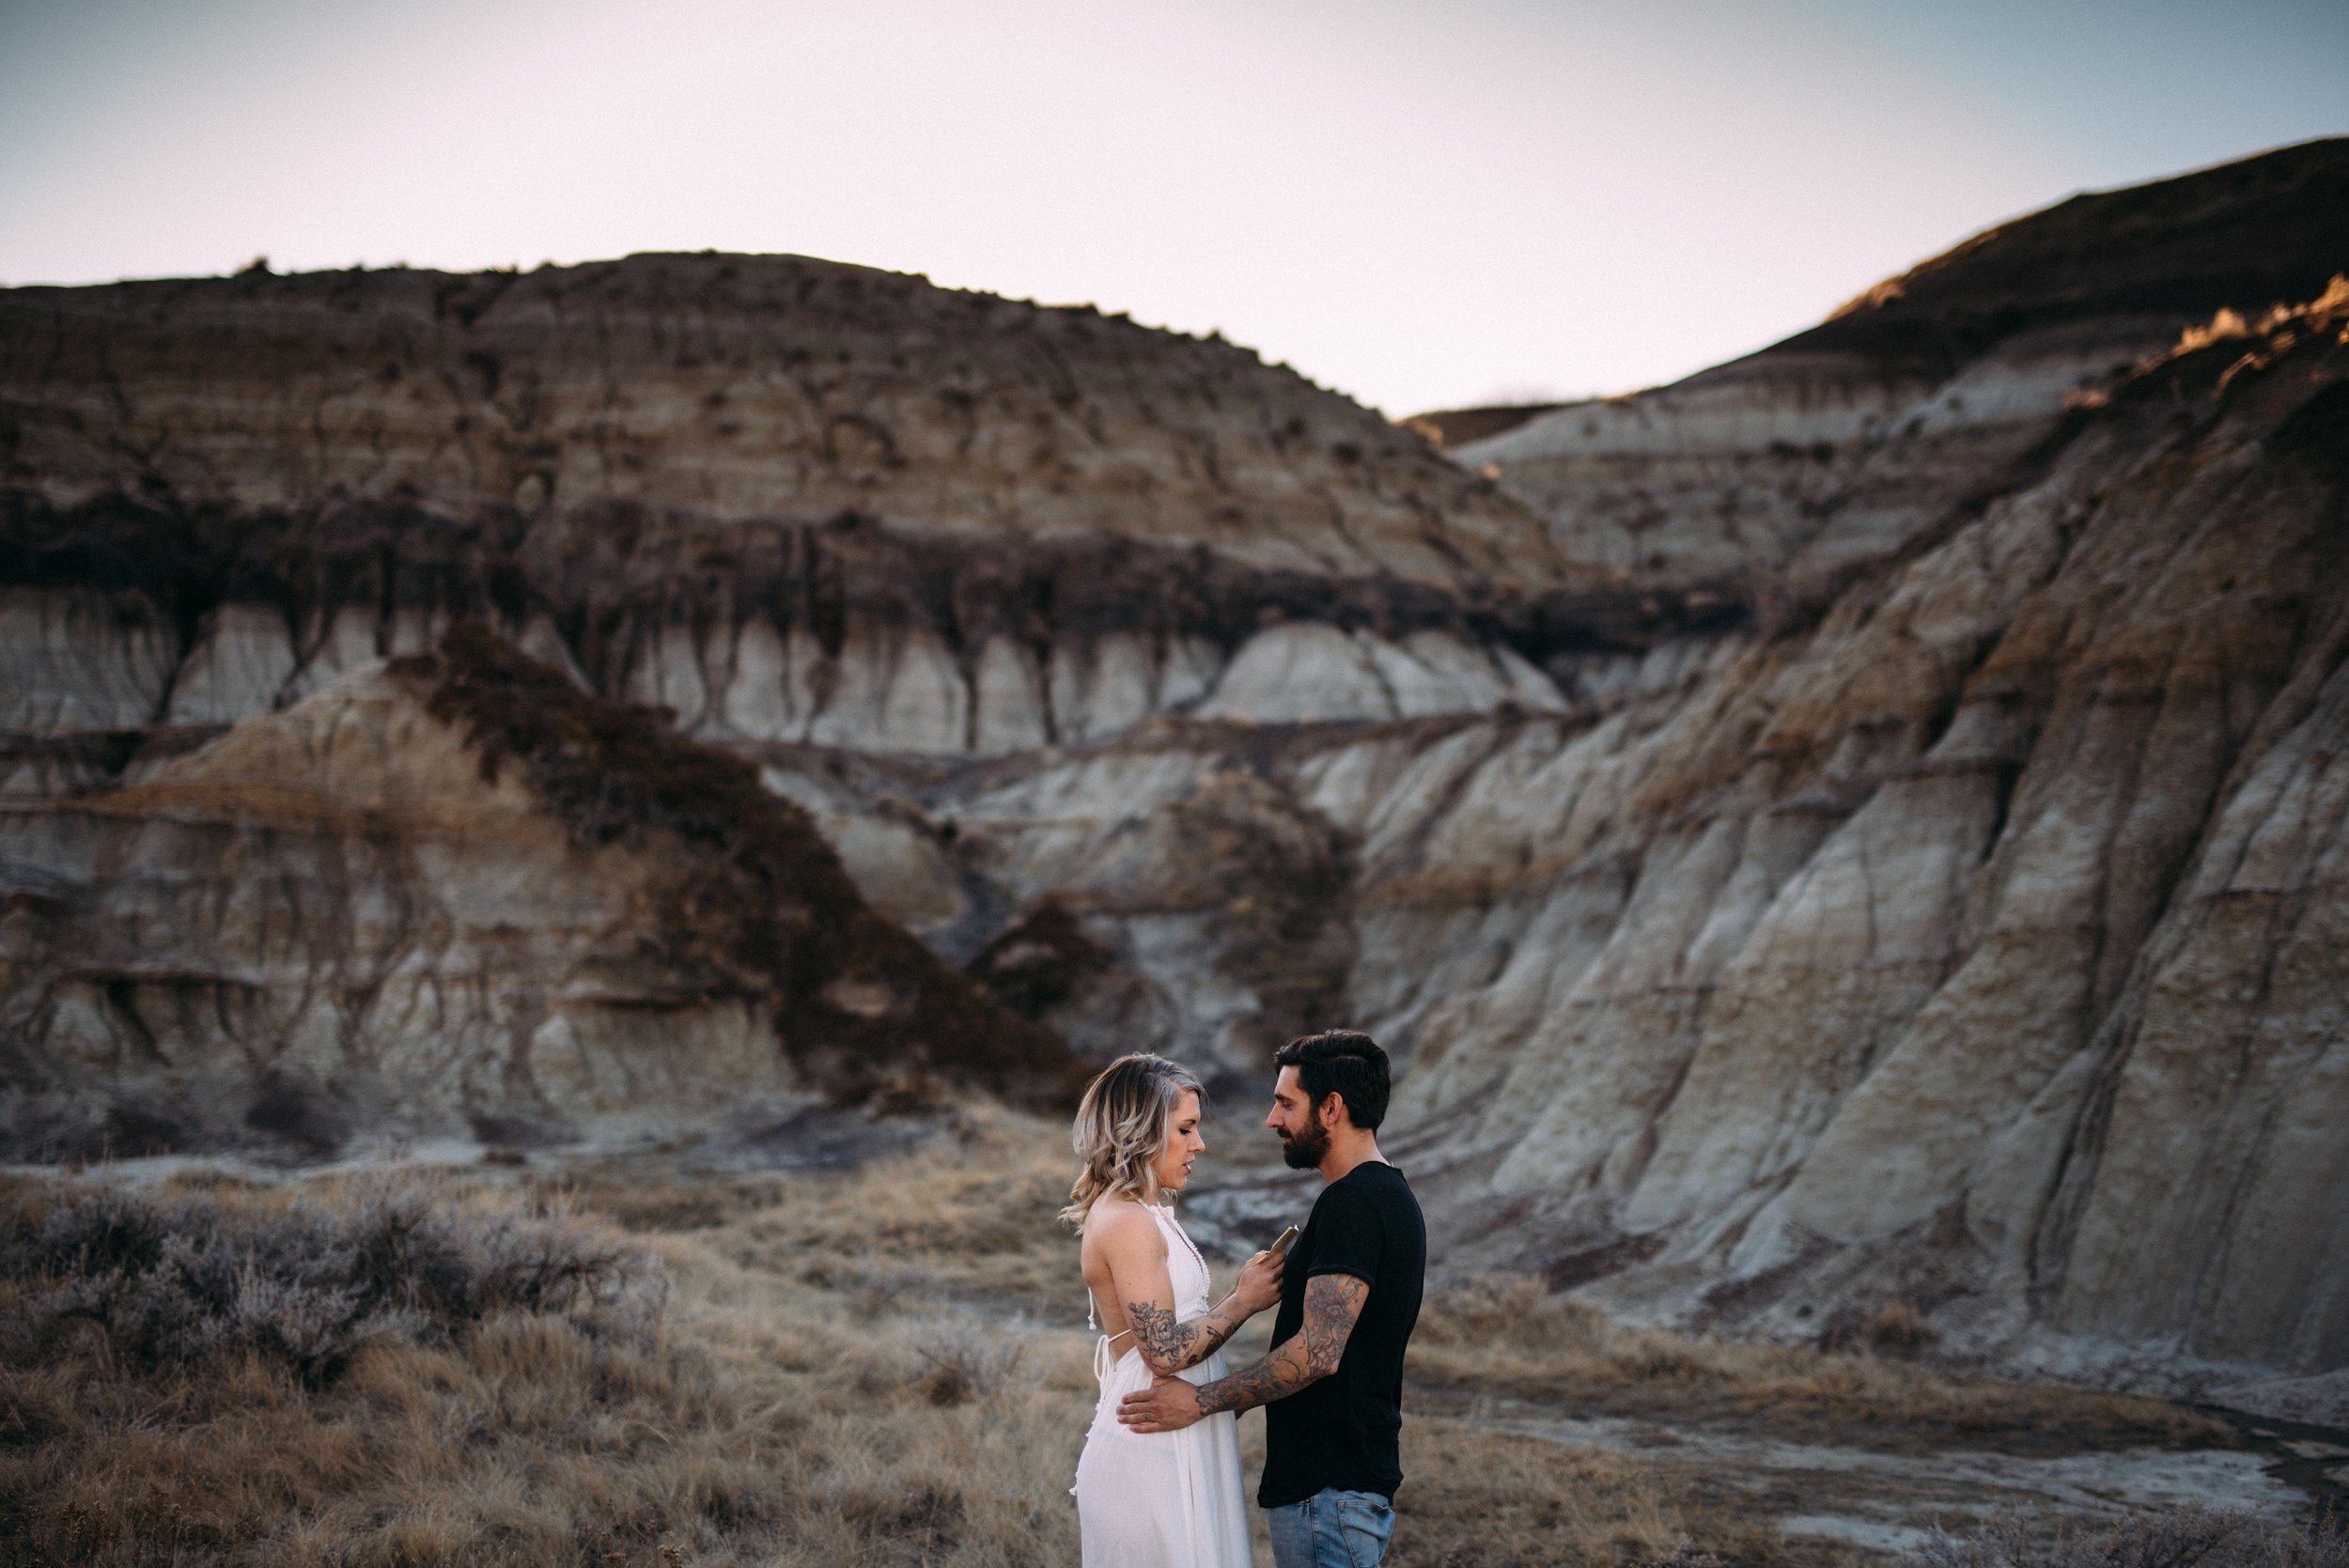 kaihla_tonai_intimate_wedding_elopement_photographer_3570